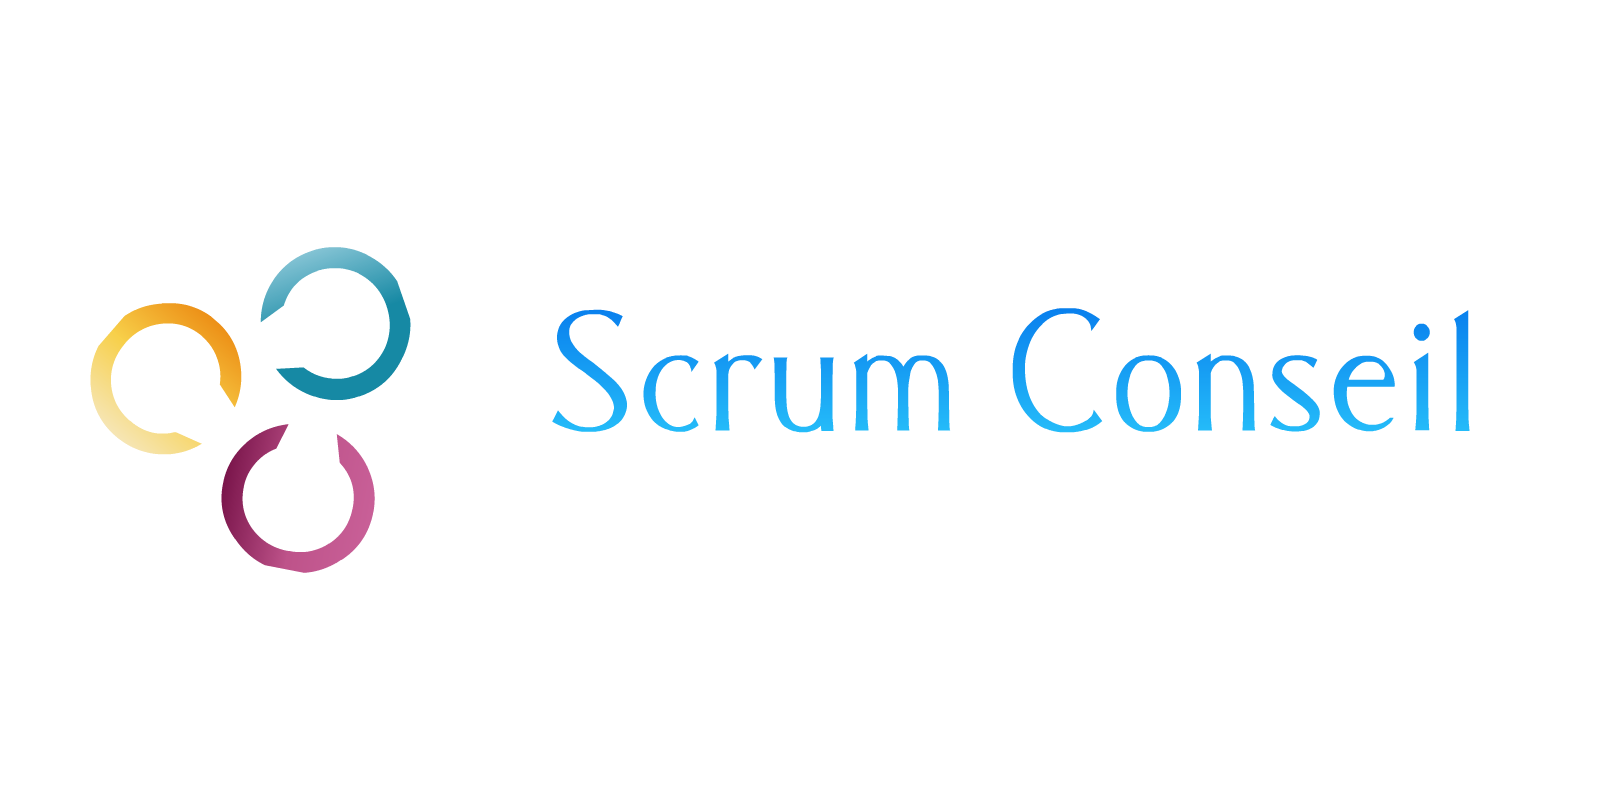 Scrum Conseil